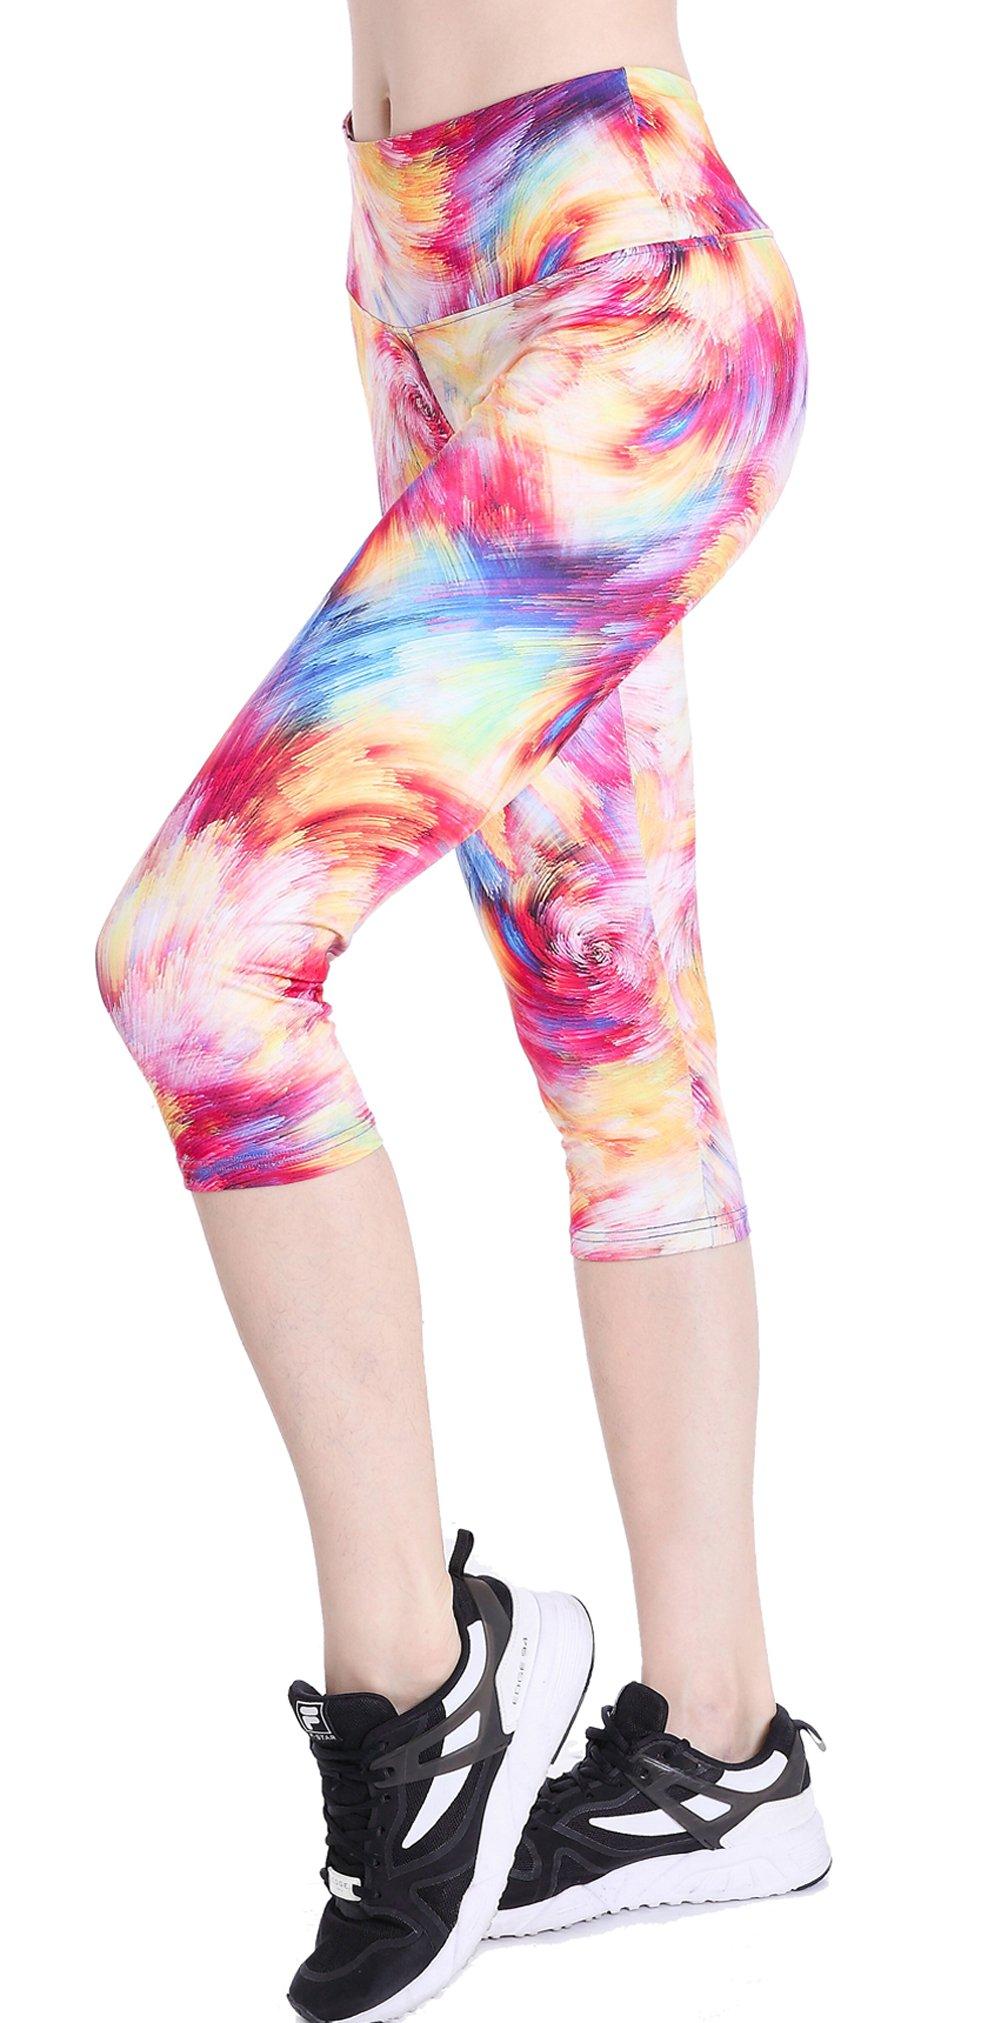 Picotee Women's High Waist Tummy Control Yoga Pants Workout Capri Leggings w Hidden Pocket (Tornado Orange, M)